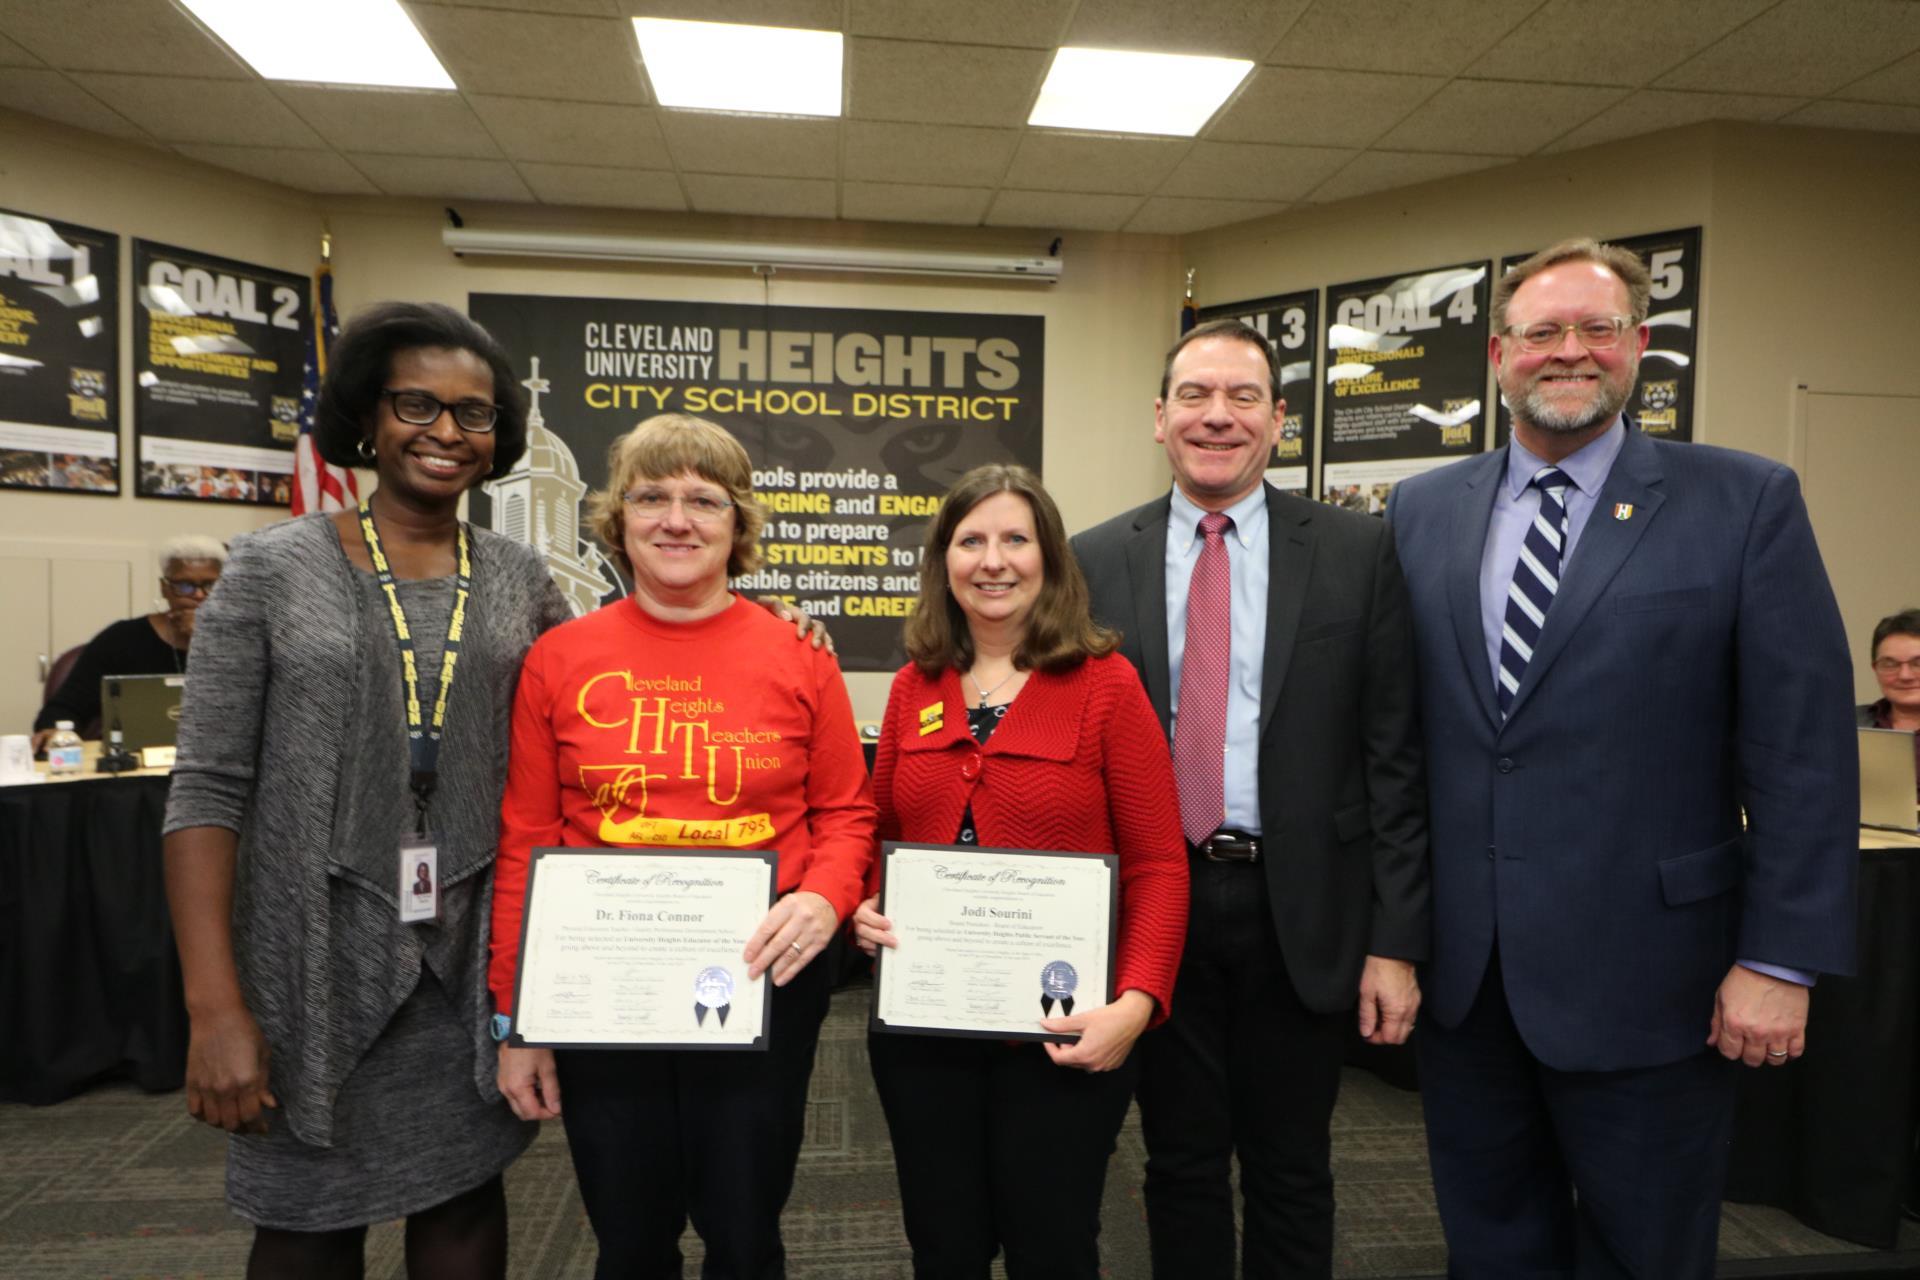 Civic Award Winners